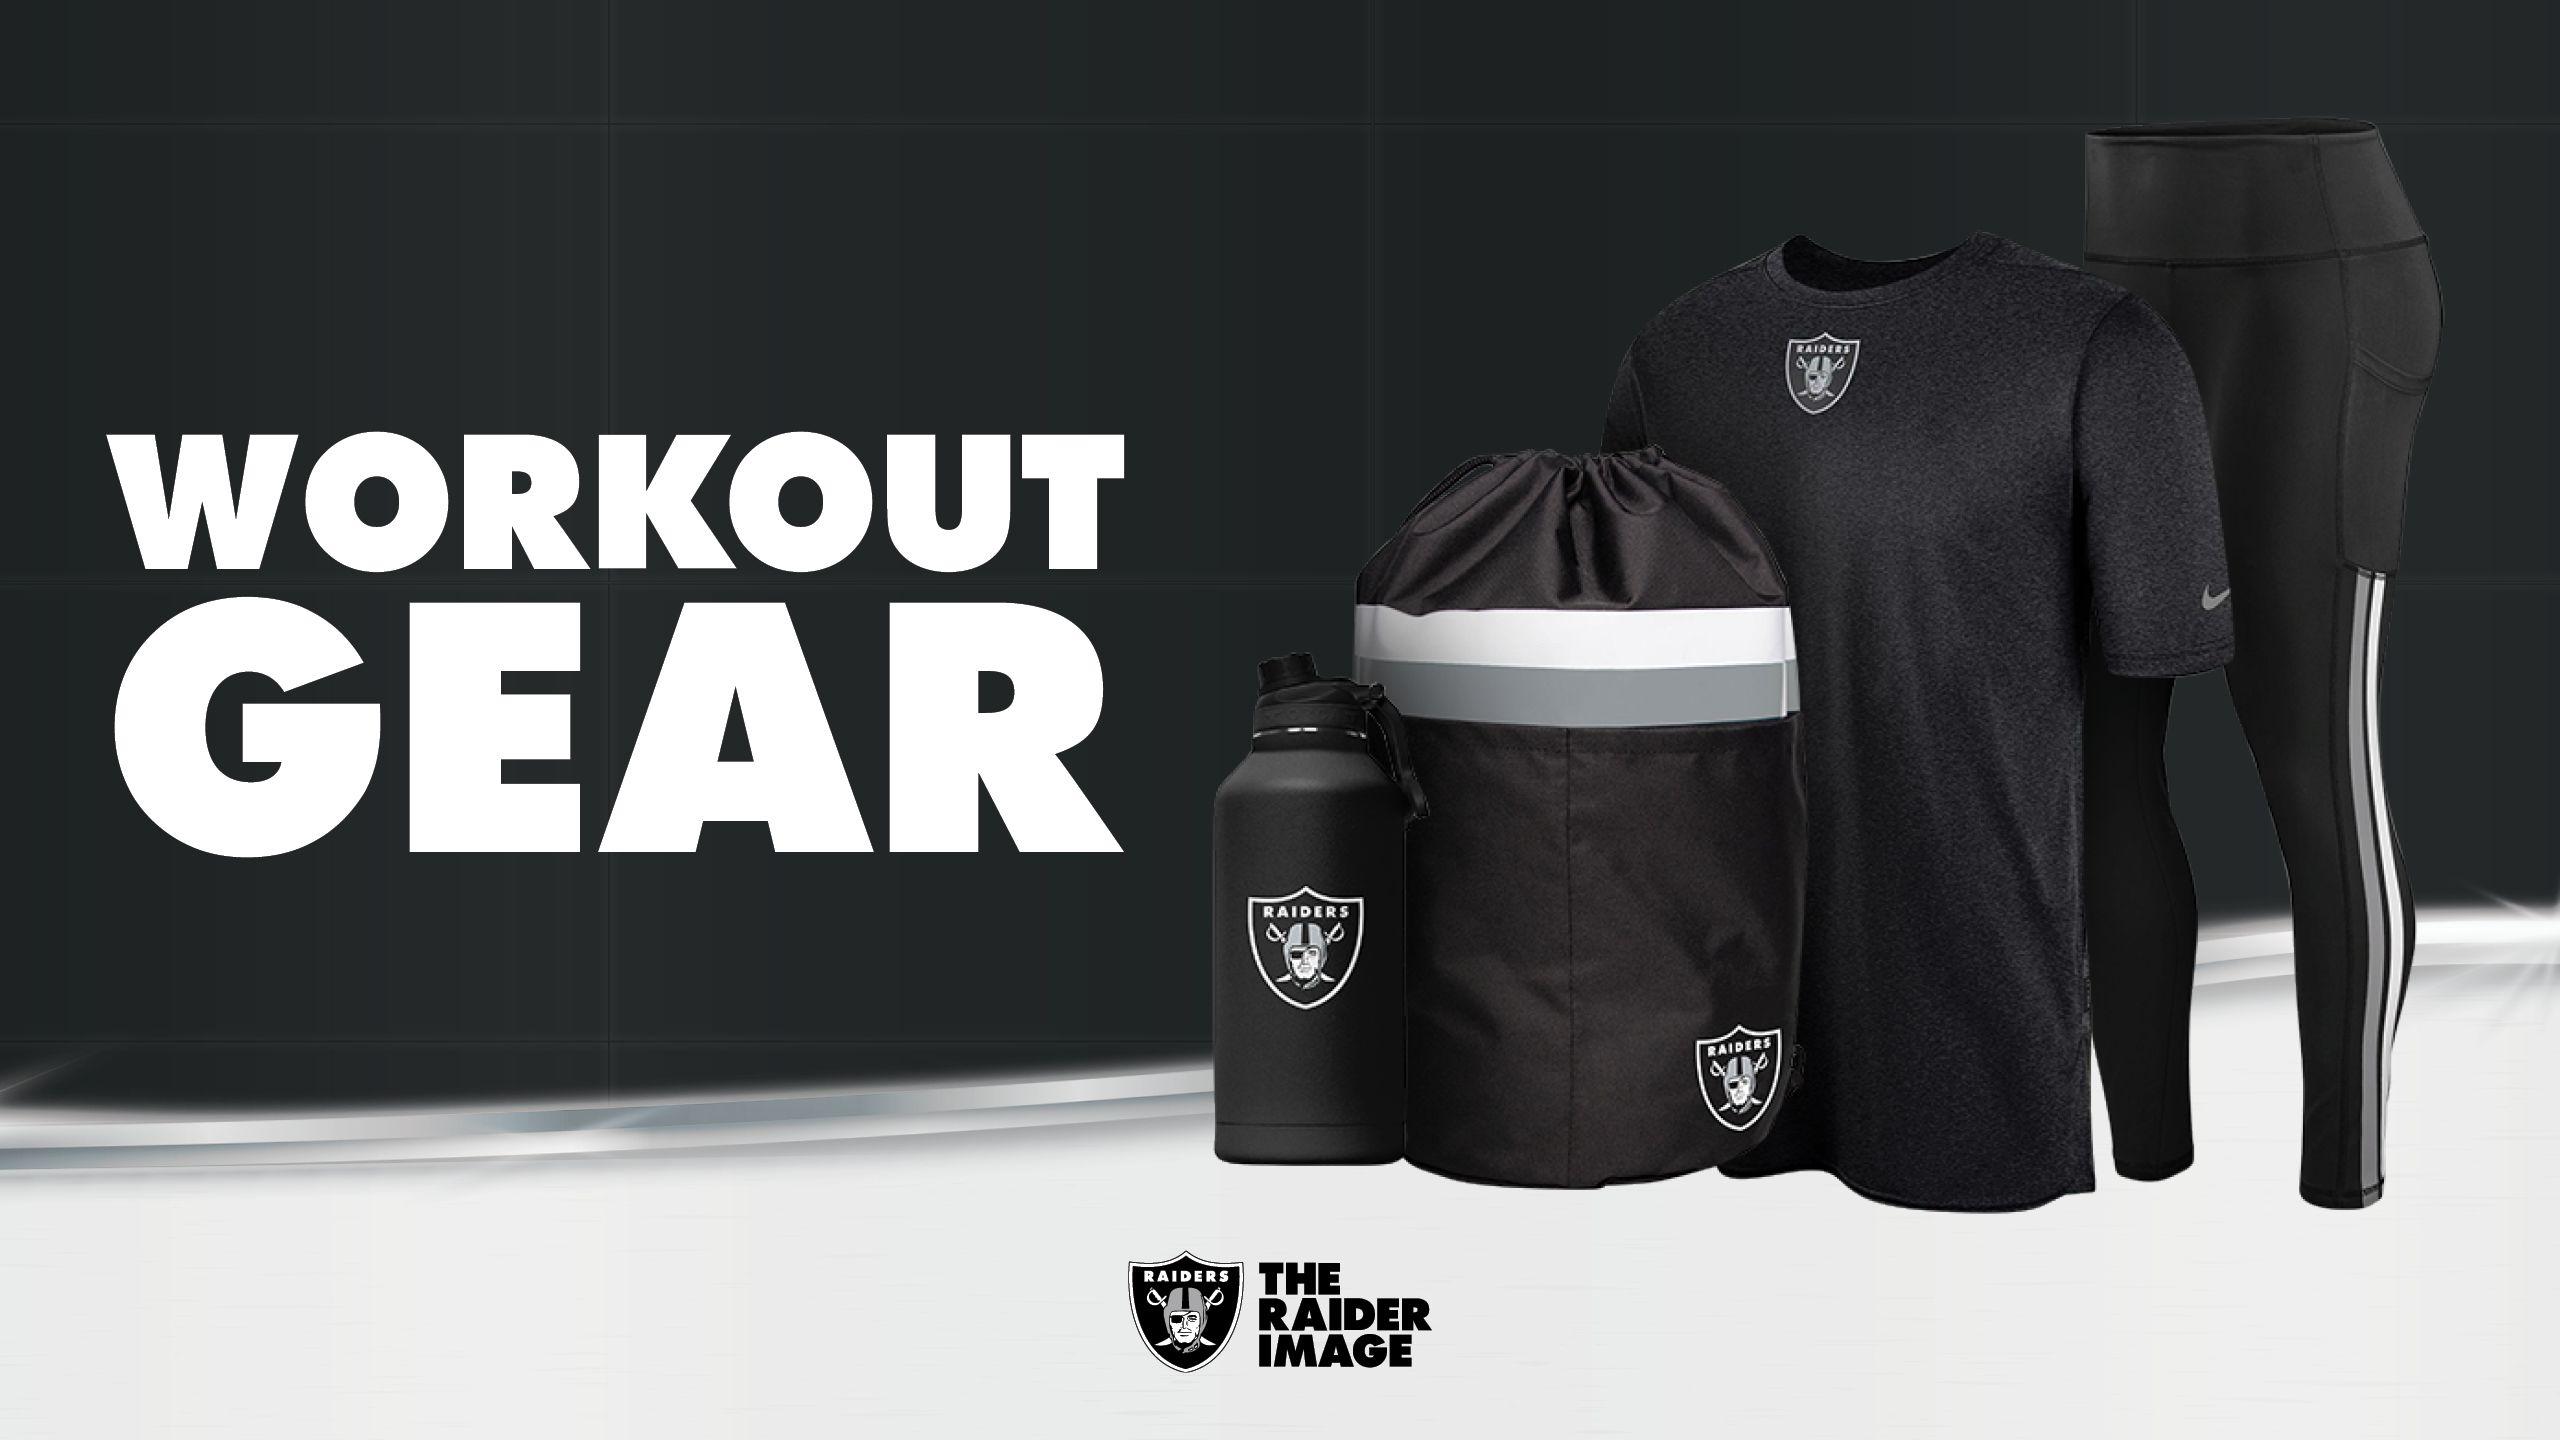 Raiders Workout Gear